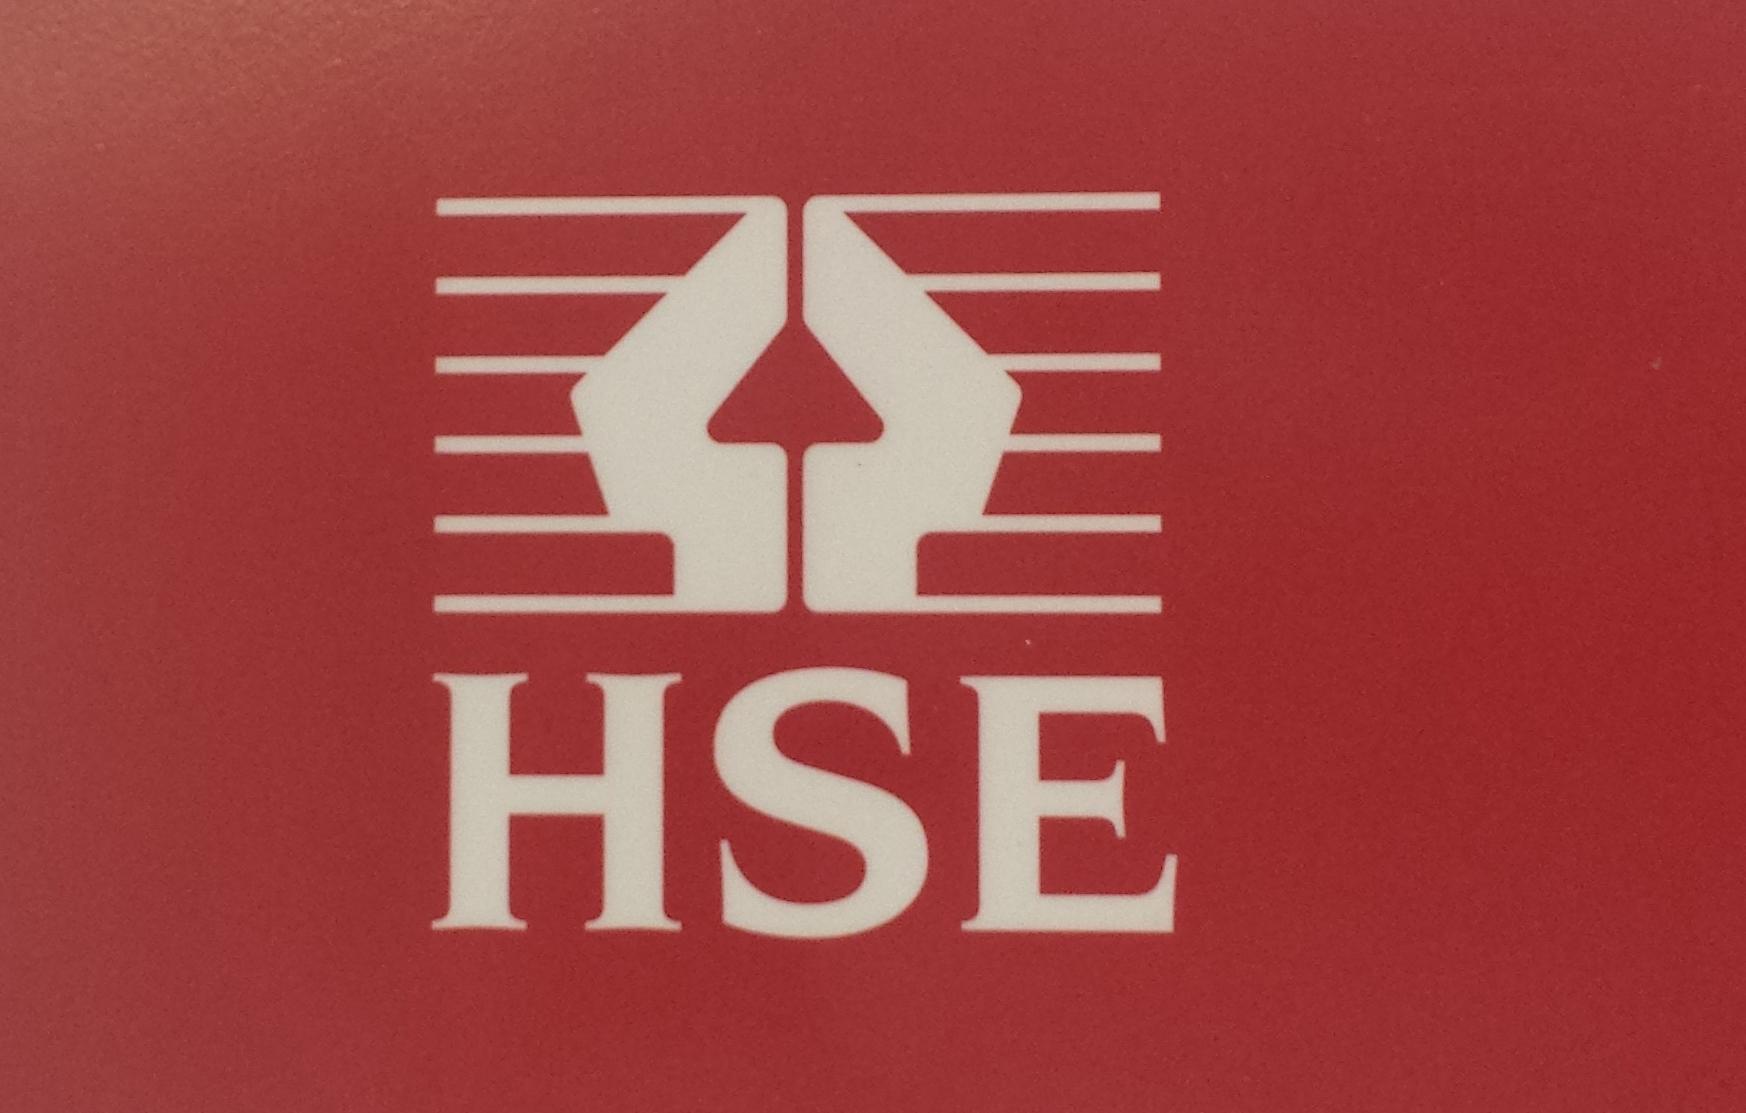 Landlord HSE logo